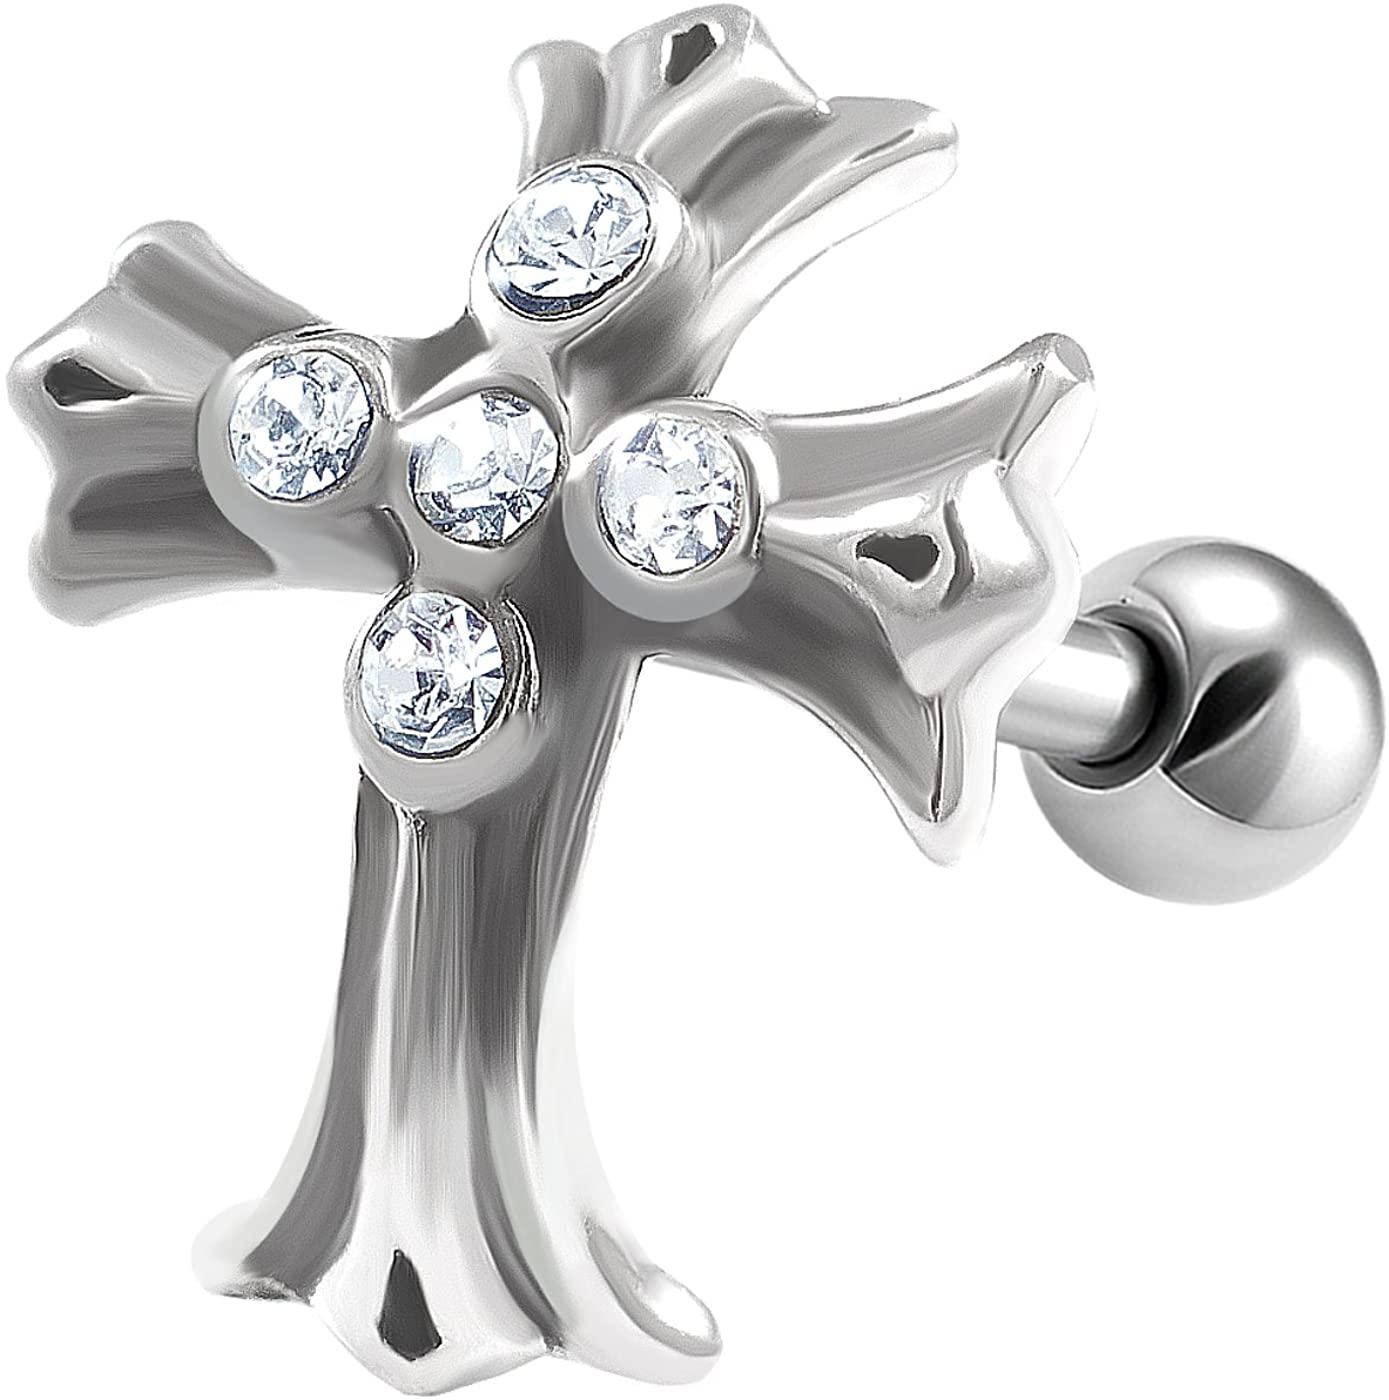 bodyjewellery 1Pcs 16g 6mm Tragus Earrings Cross Steel Barbell Stud Auricle Helix Eyebrow Pinna Stud Tragus Ear Lobe Cartilage A1YX